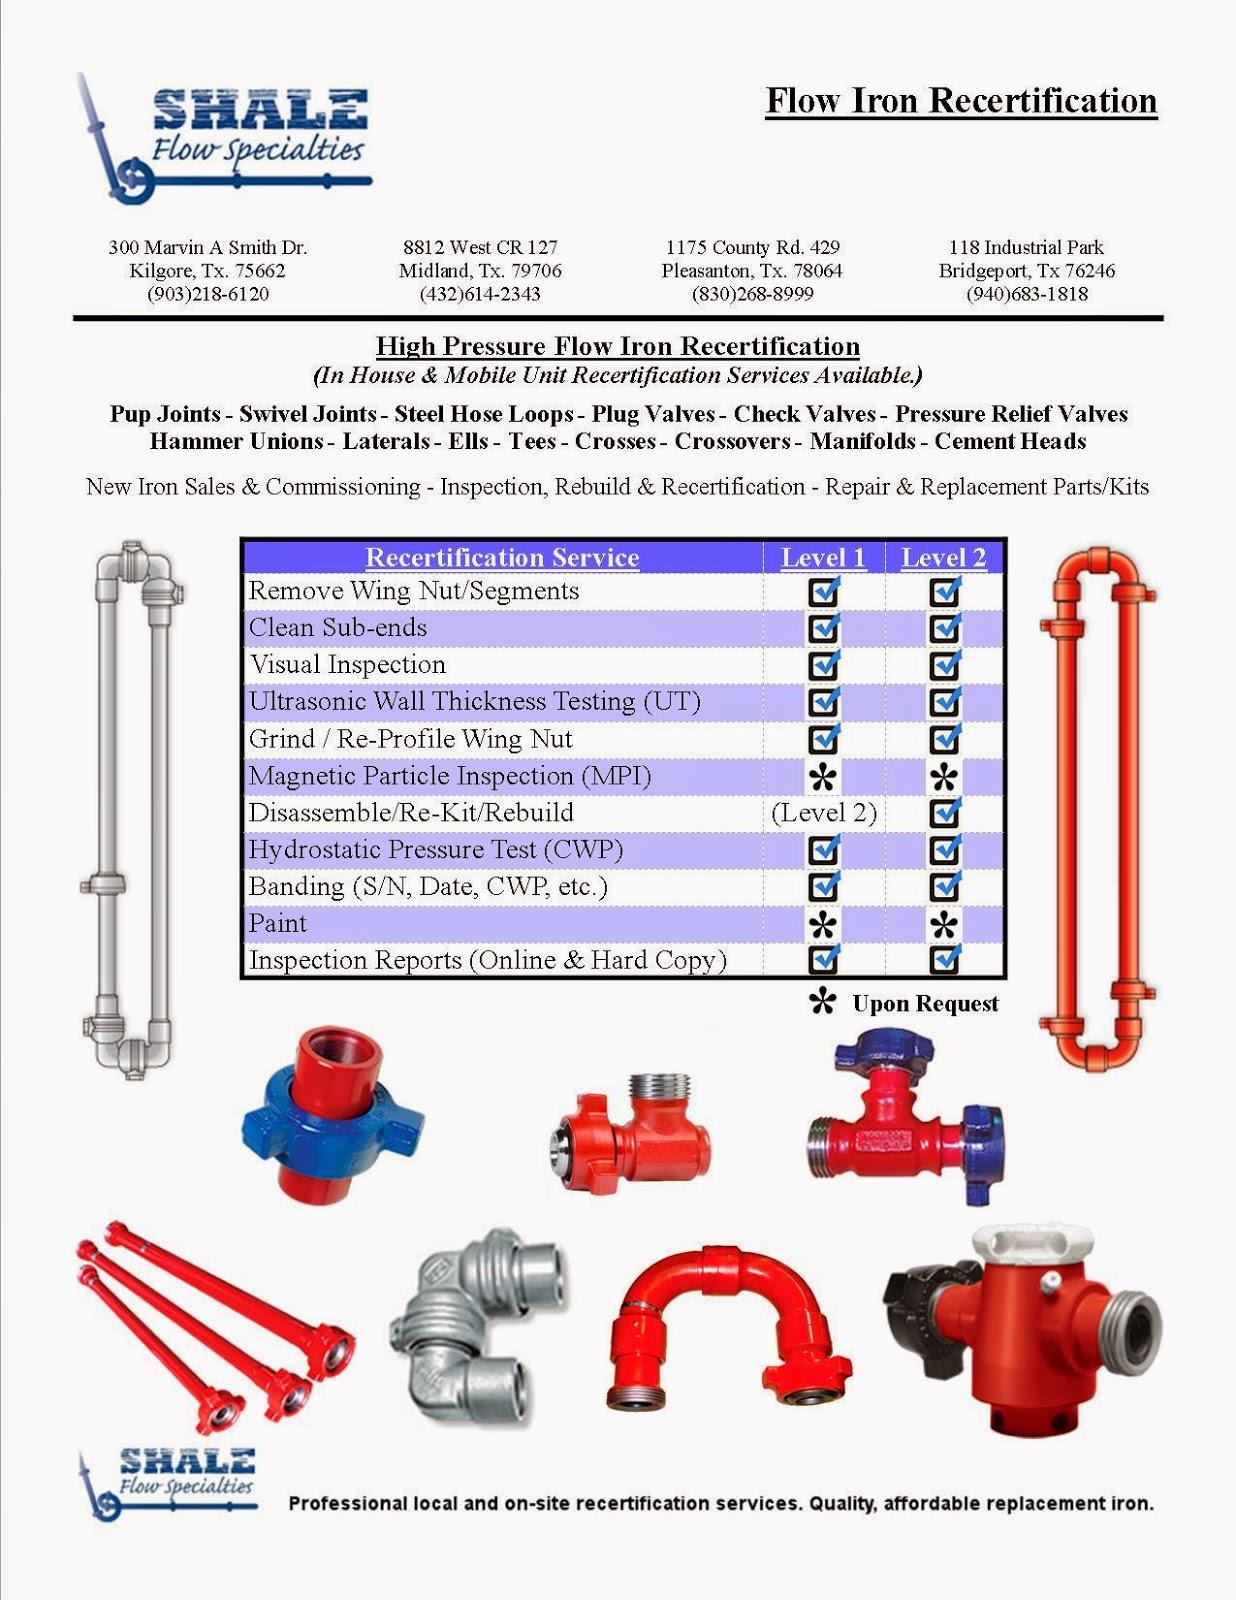 High Pressure Flow Iron : High pressure iron flow line inspection recertification